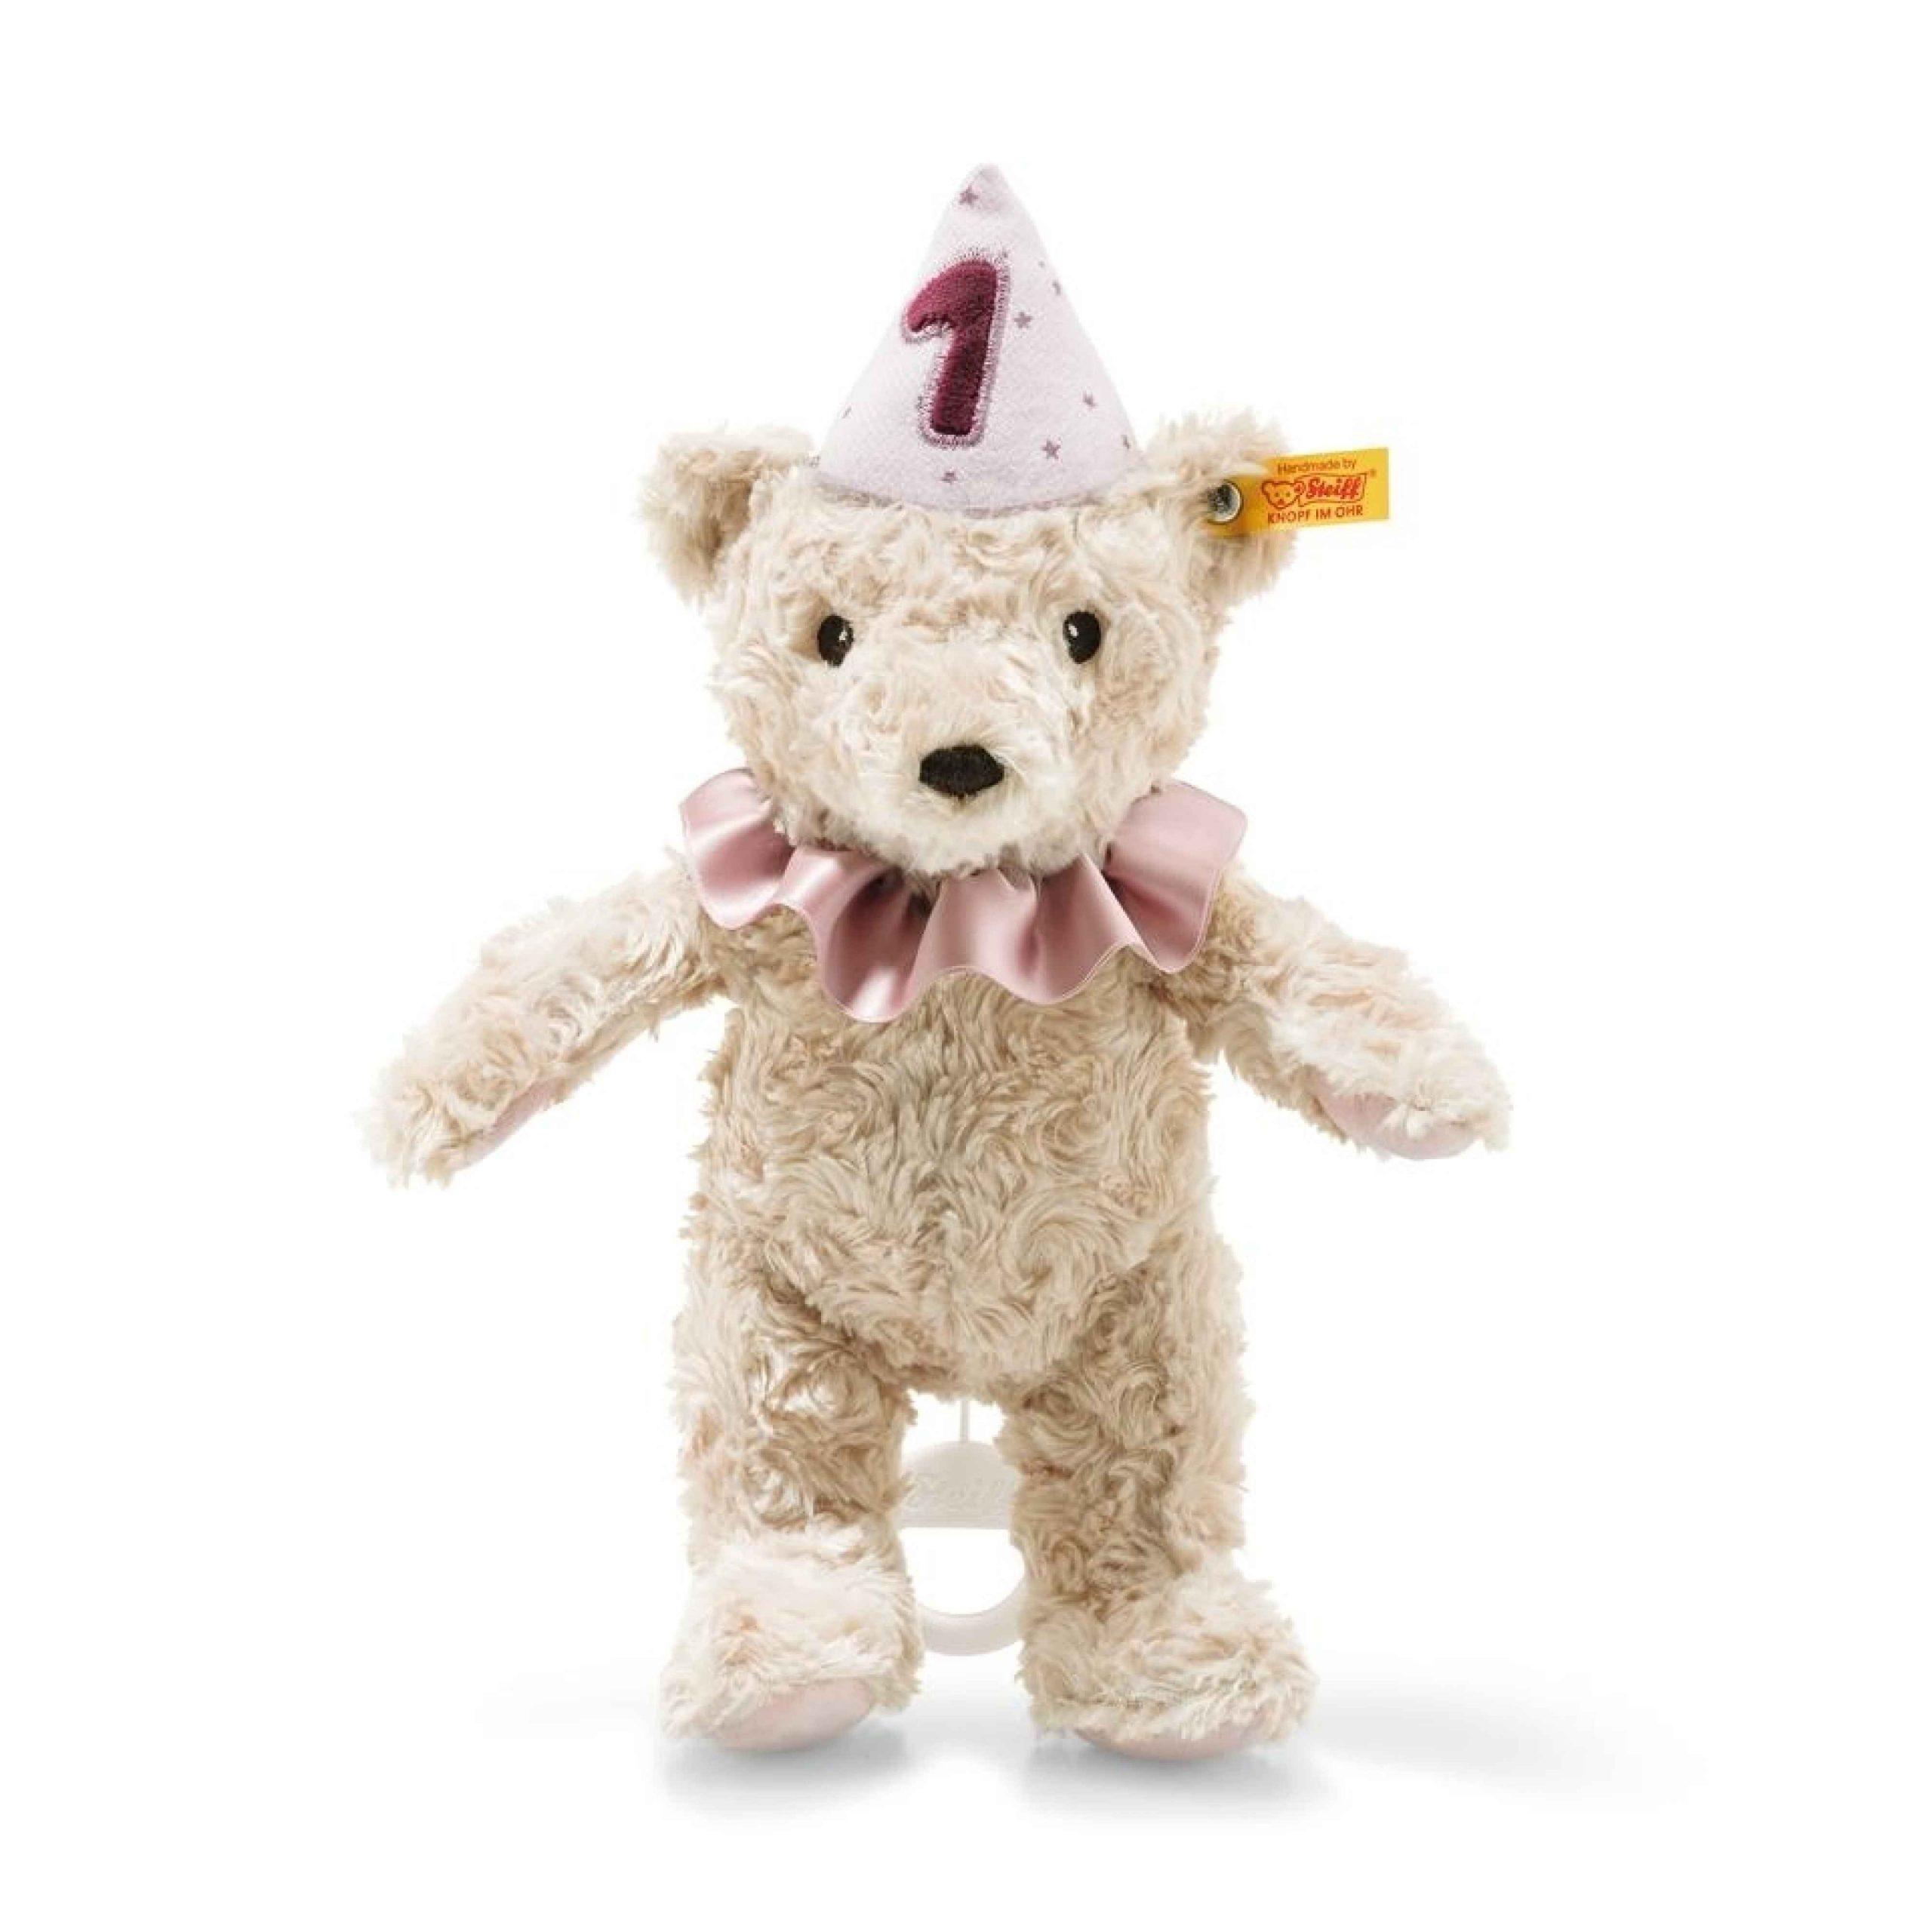 Steiff First Birthday Girl Teddy Bear with Musical Pull String - EAN 240874